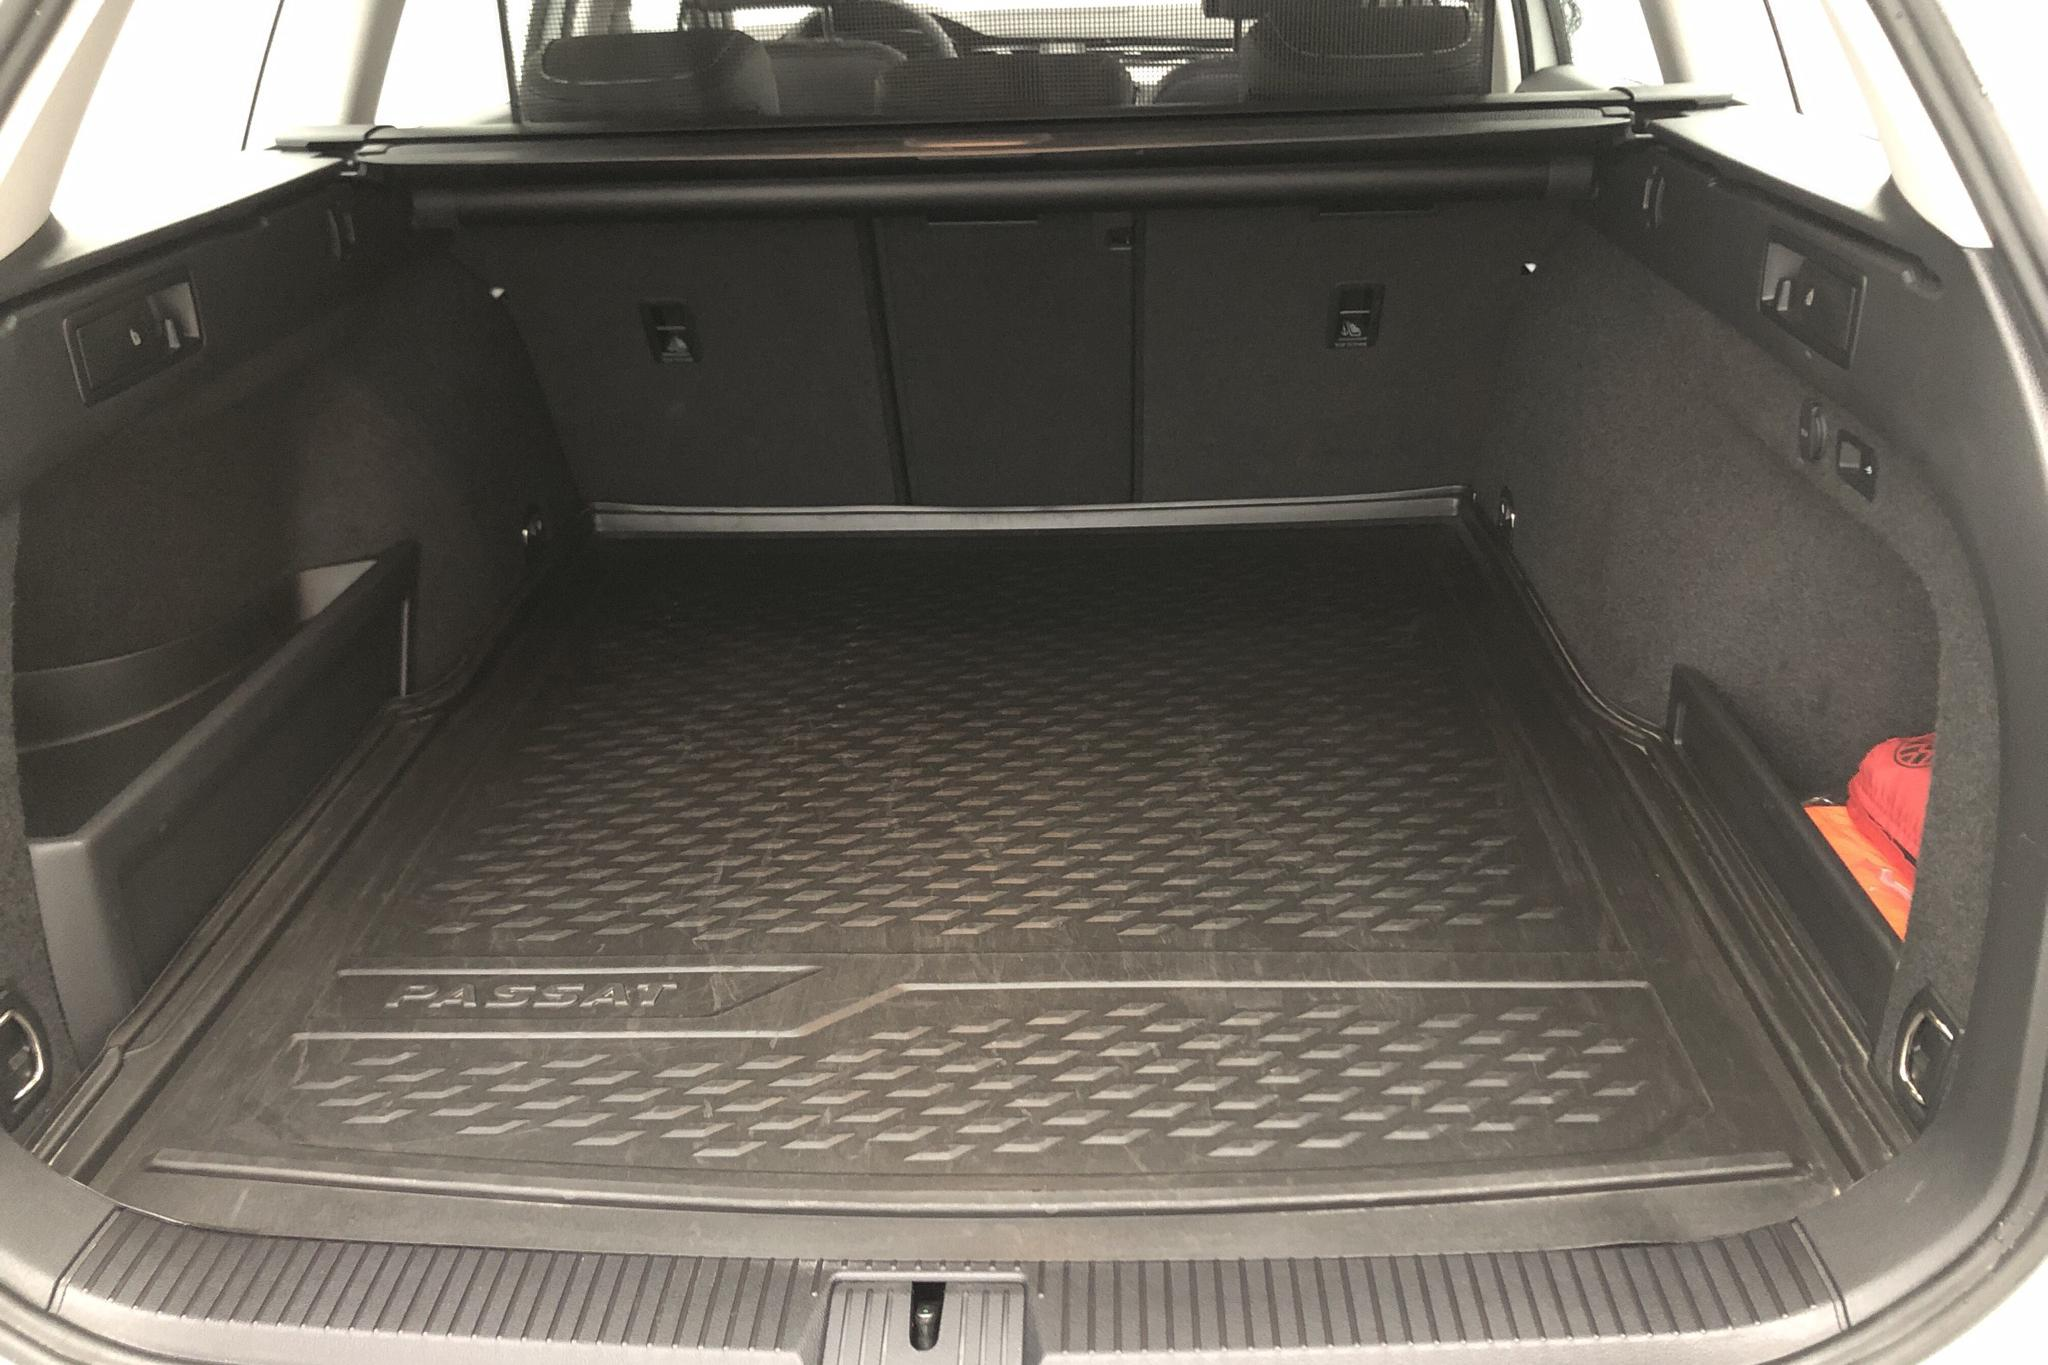 VW Passat 1.4 Plug-in-Hybrid Sportscombi (218hk) - 17 090 km - Automatic - white - 2021